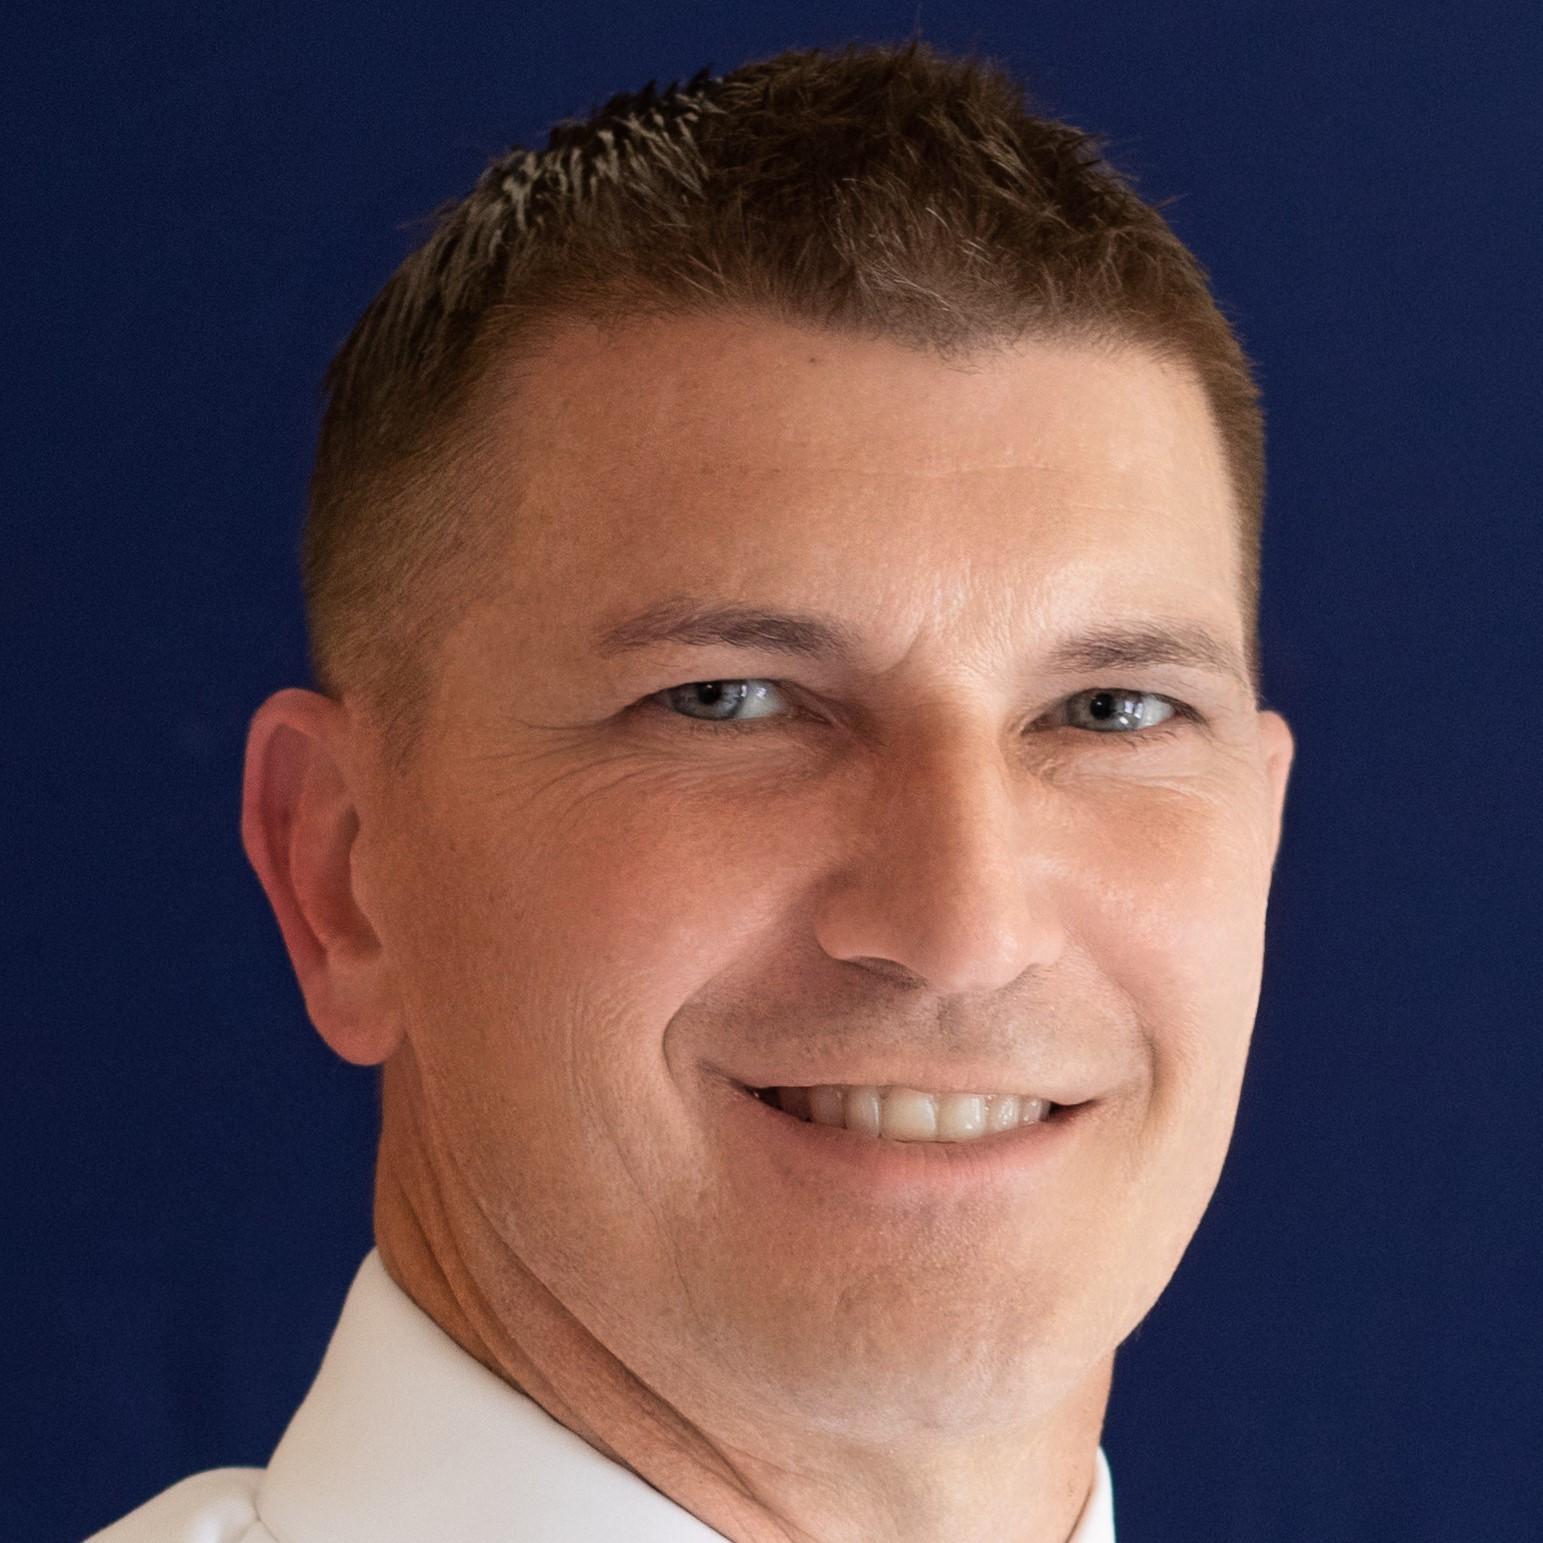 GARY PEISERT Financial Professional & Insurance Agent